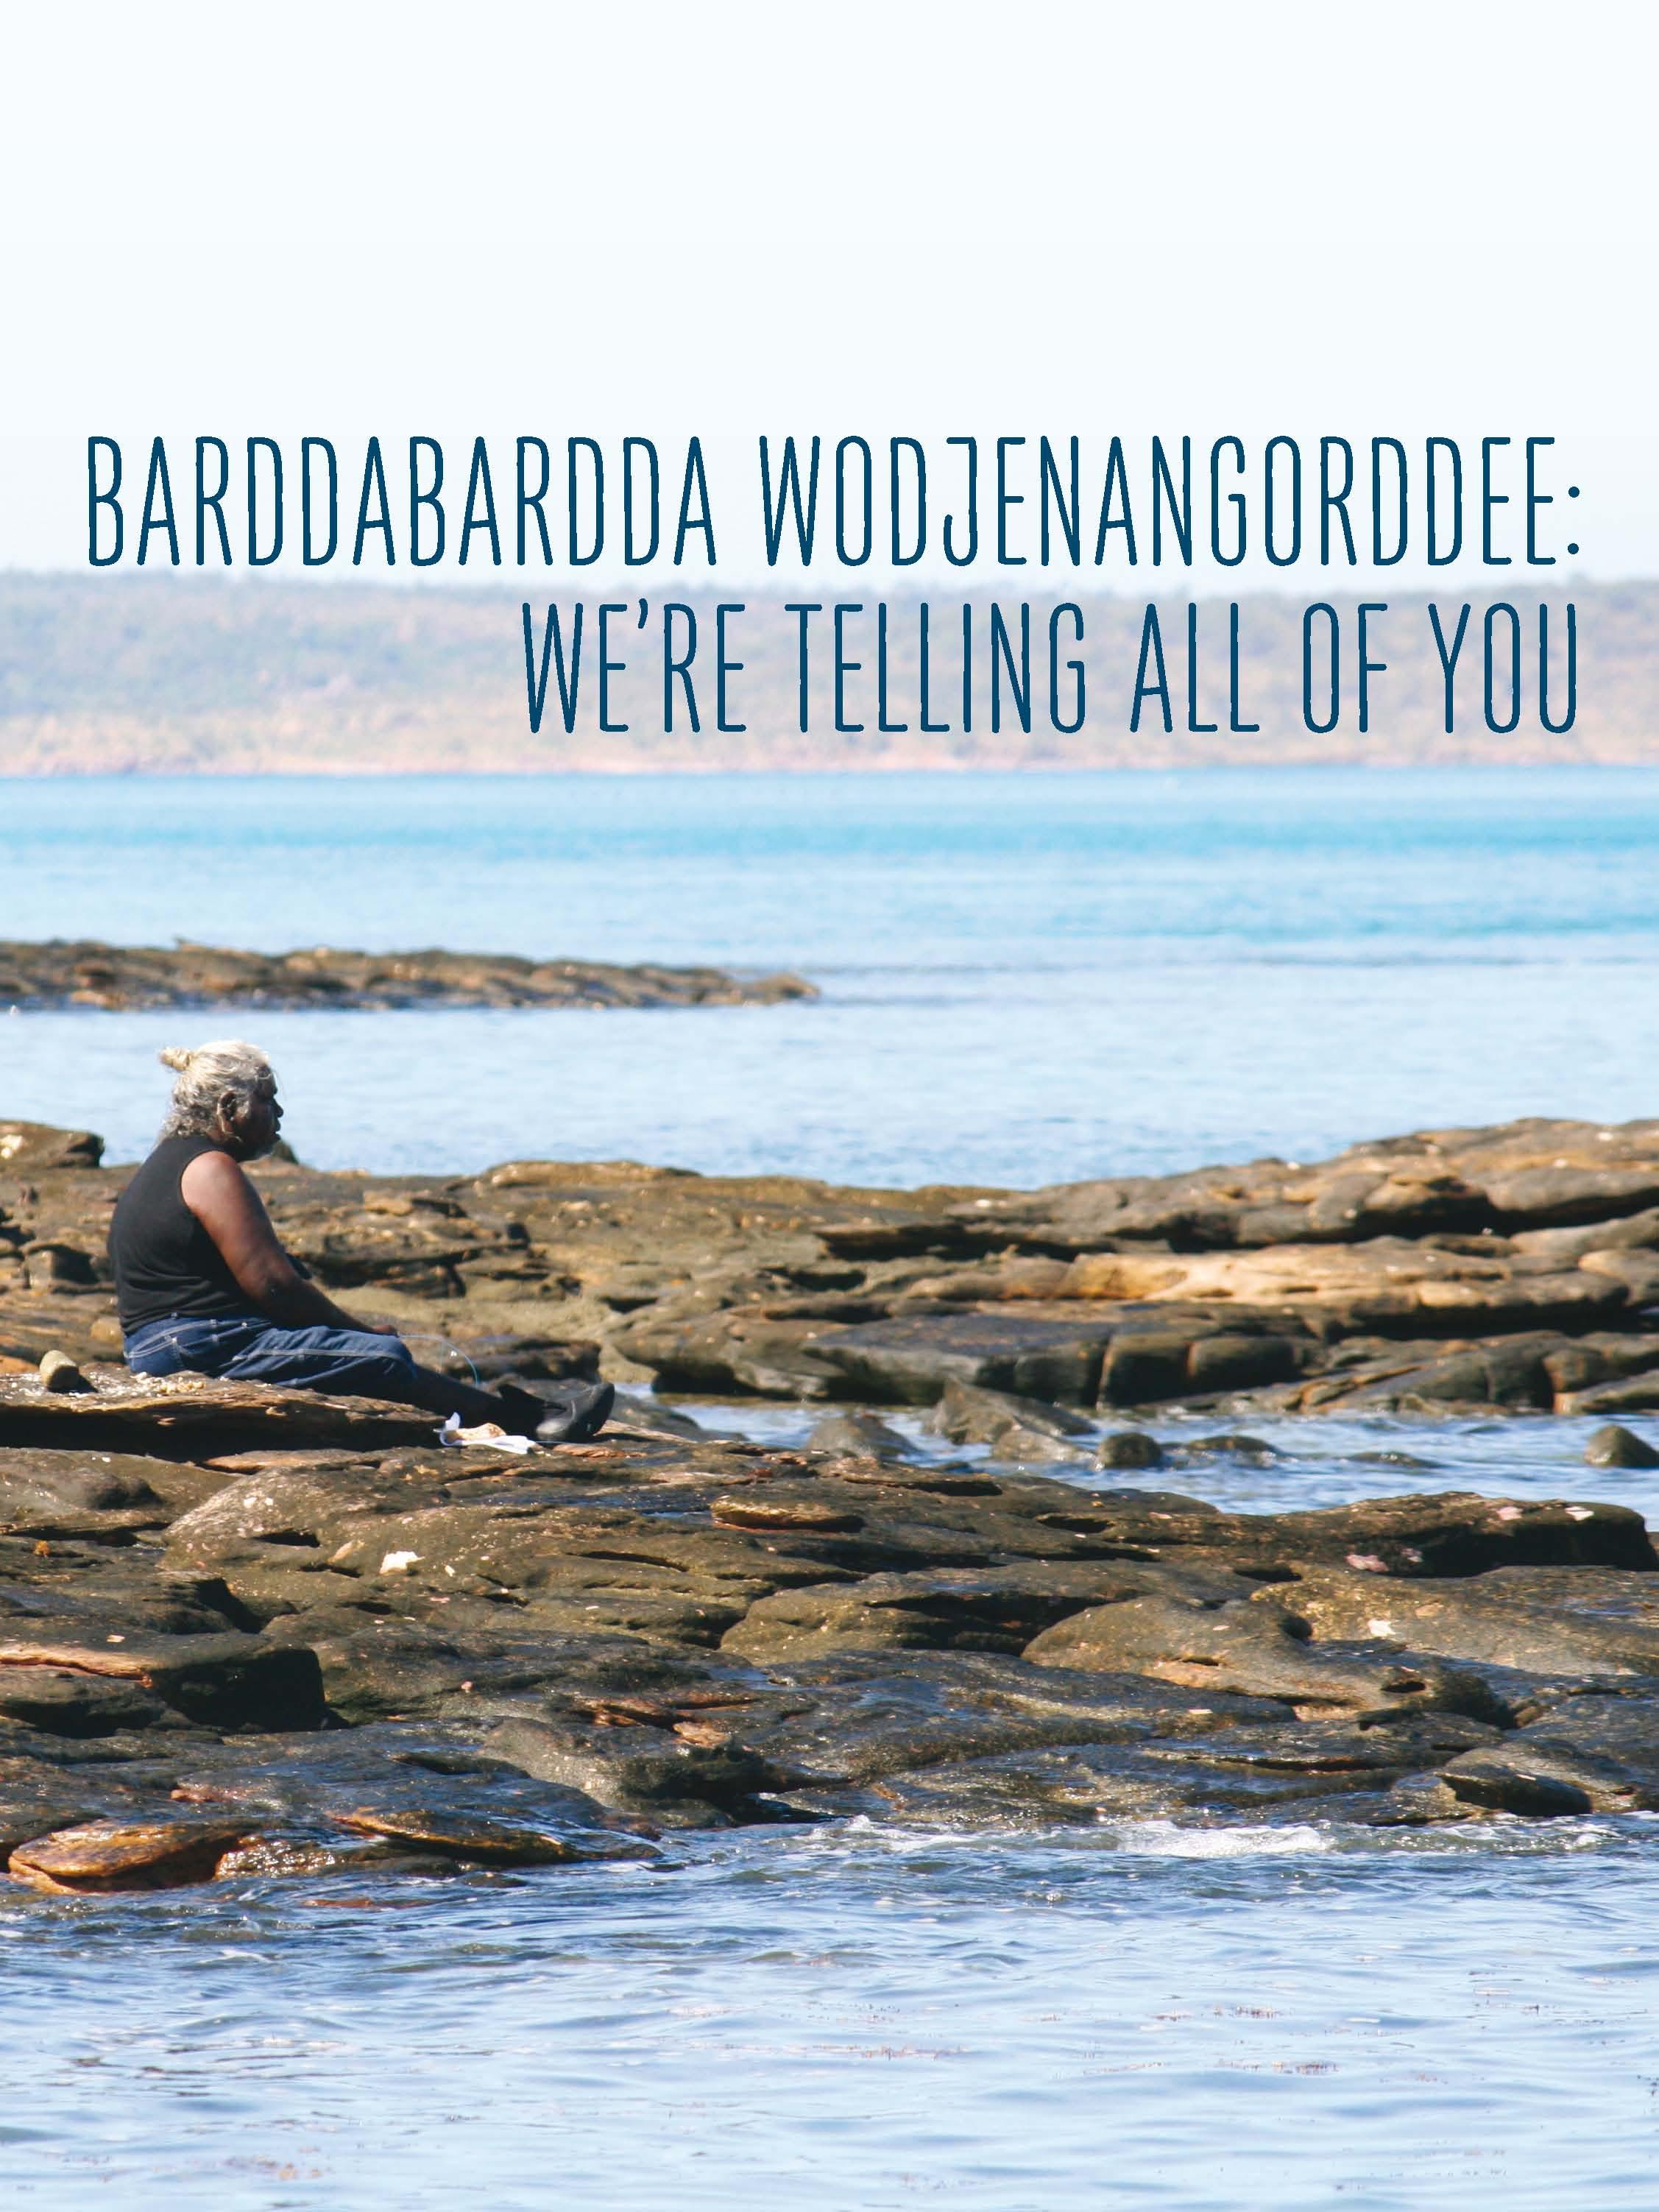 Barddabardda Wodjenangorddee: We're Telling All of You